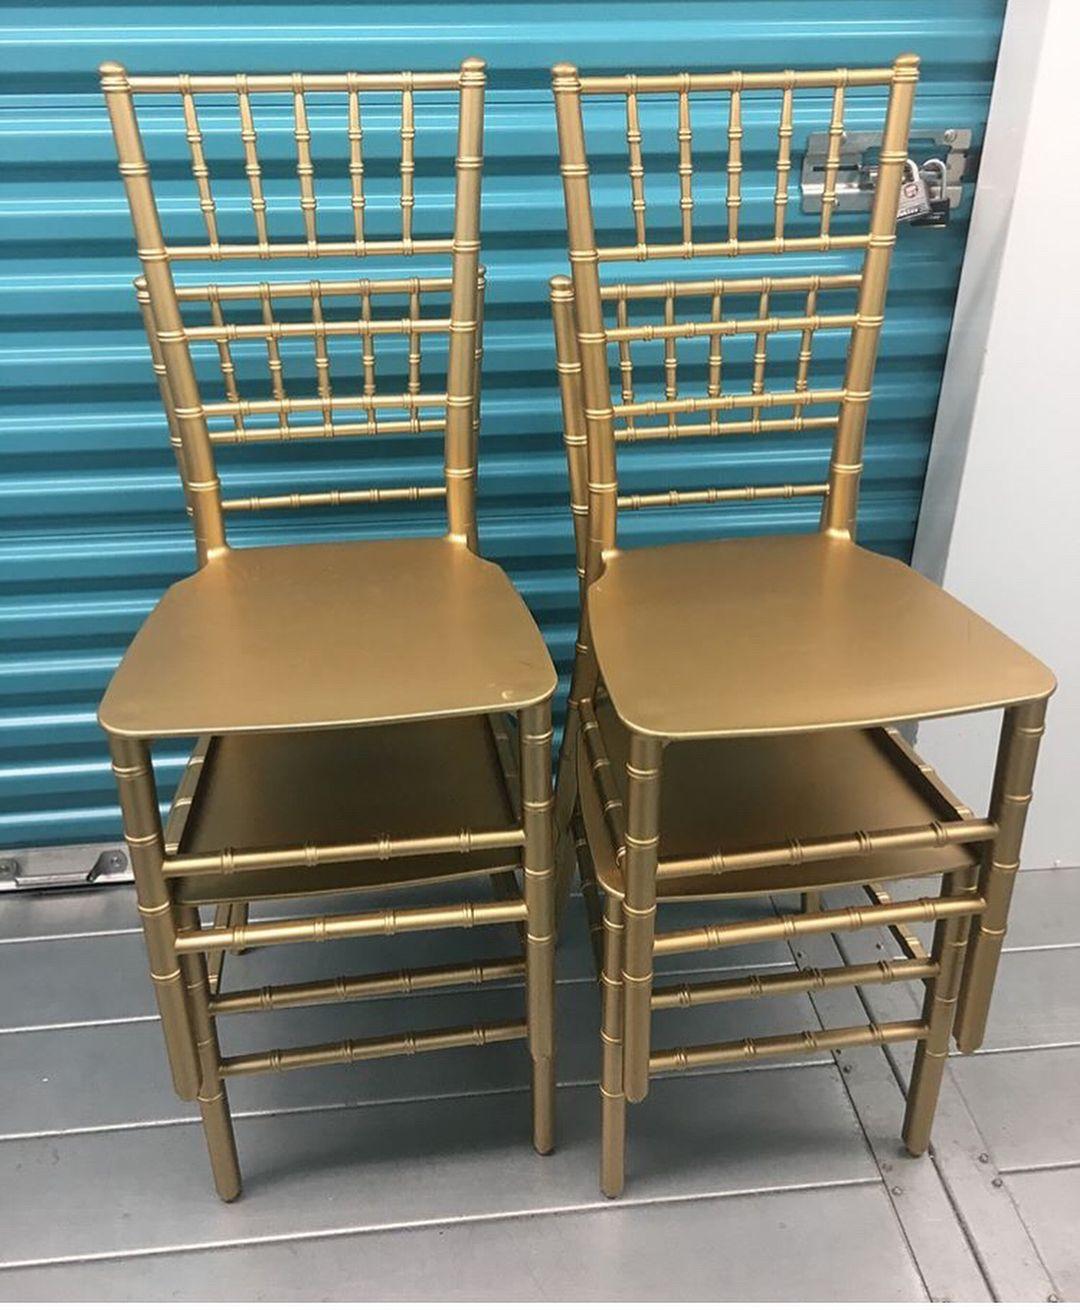 chiavari chair rental price